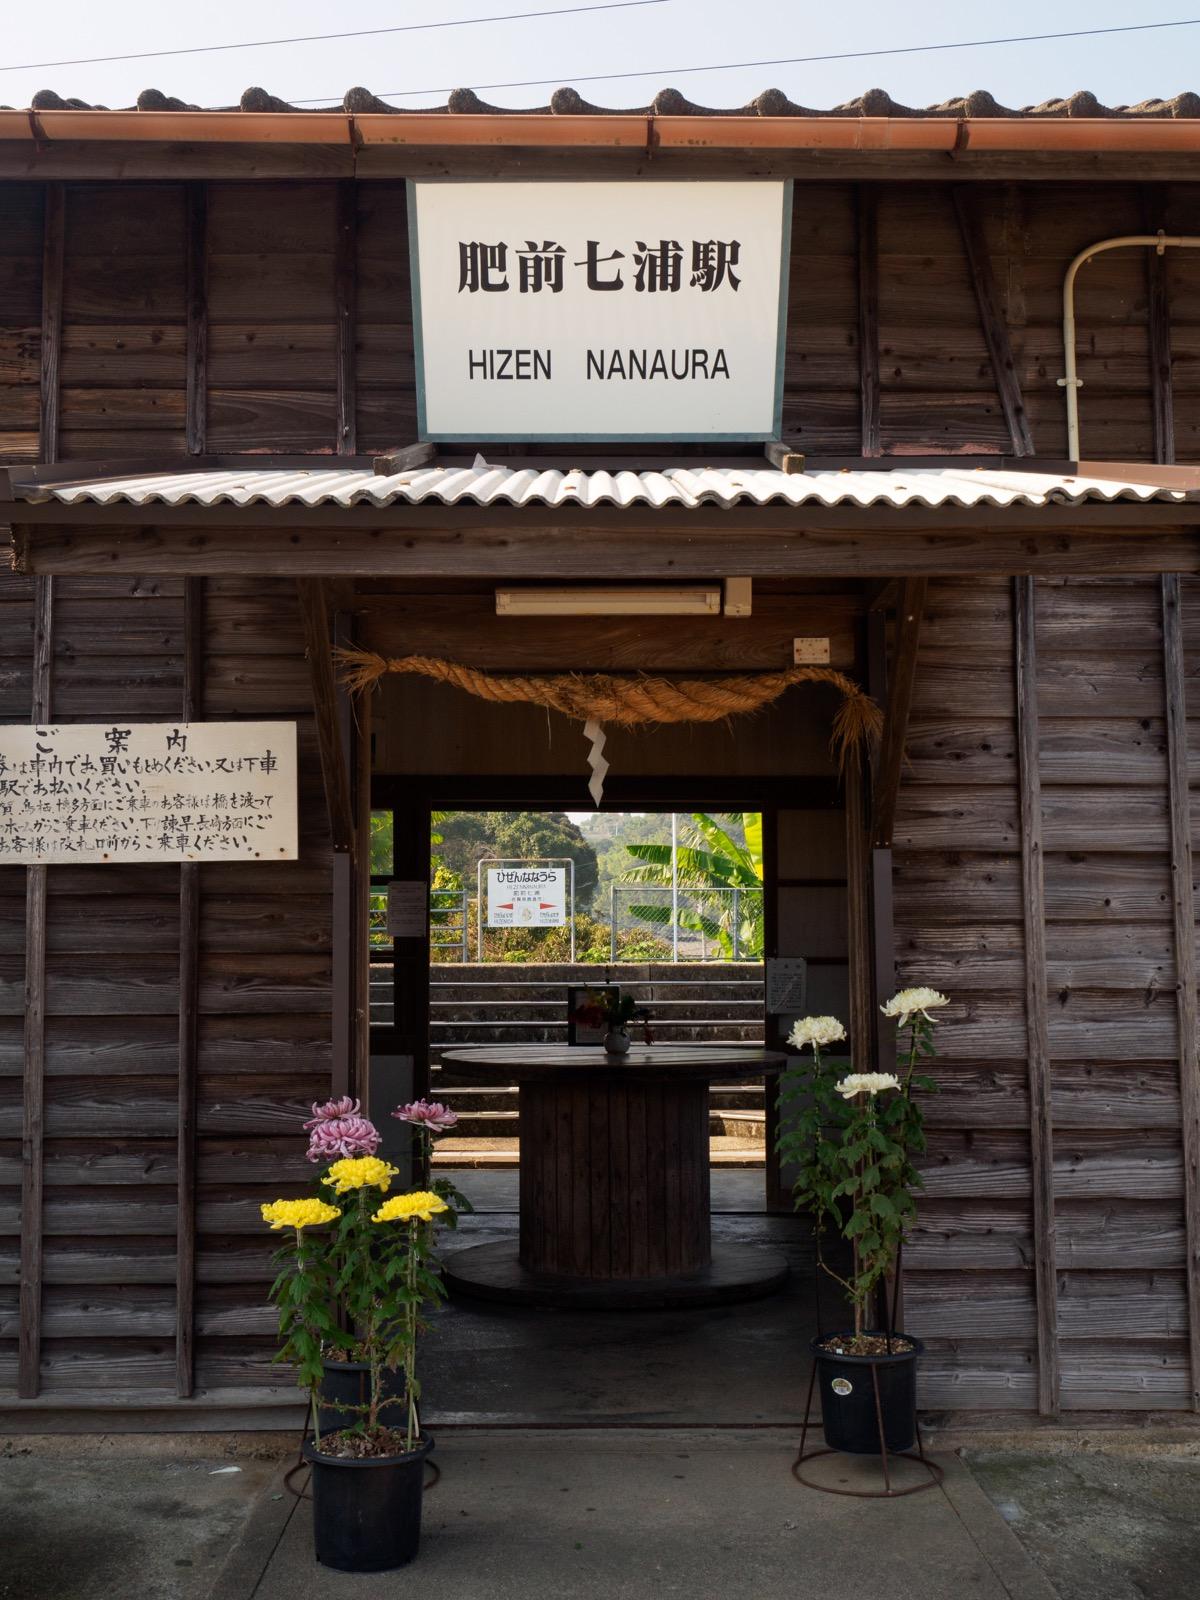 肥前七浦駅の駅舎